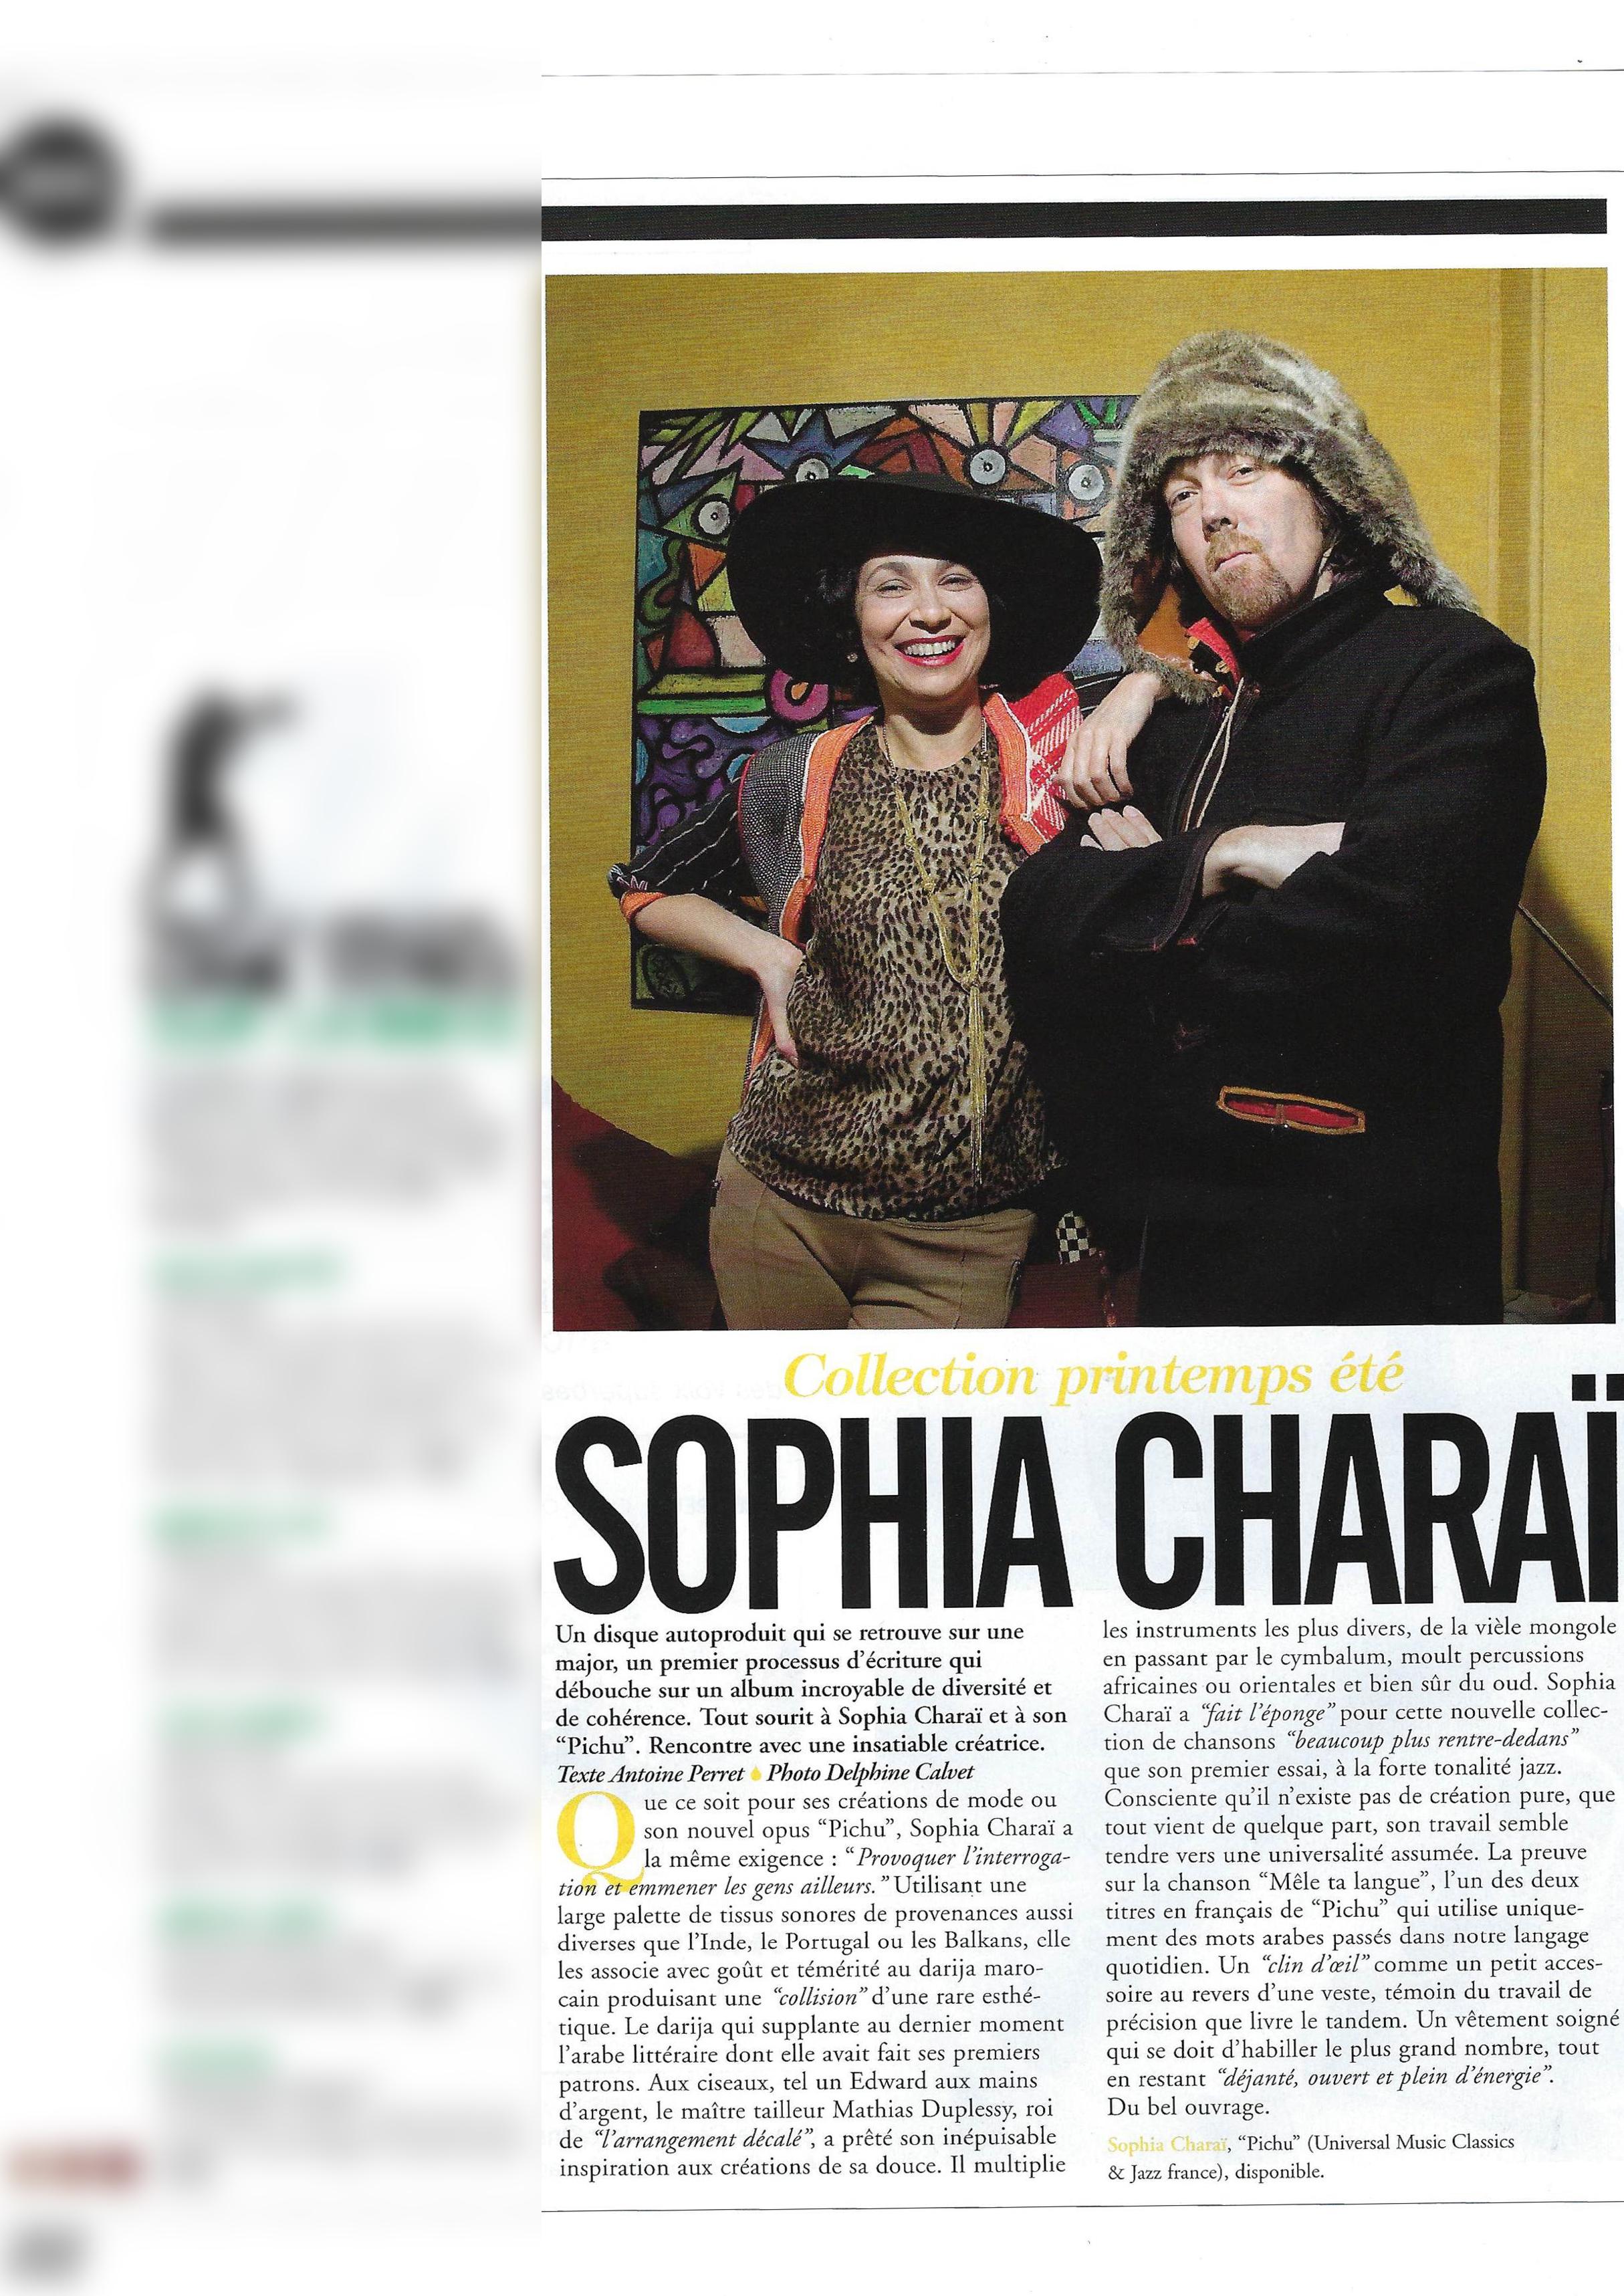 Sophia Charai (World Sound)